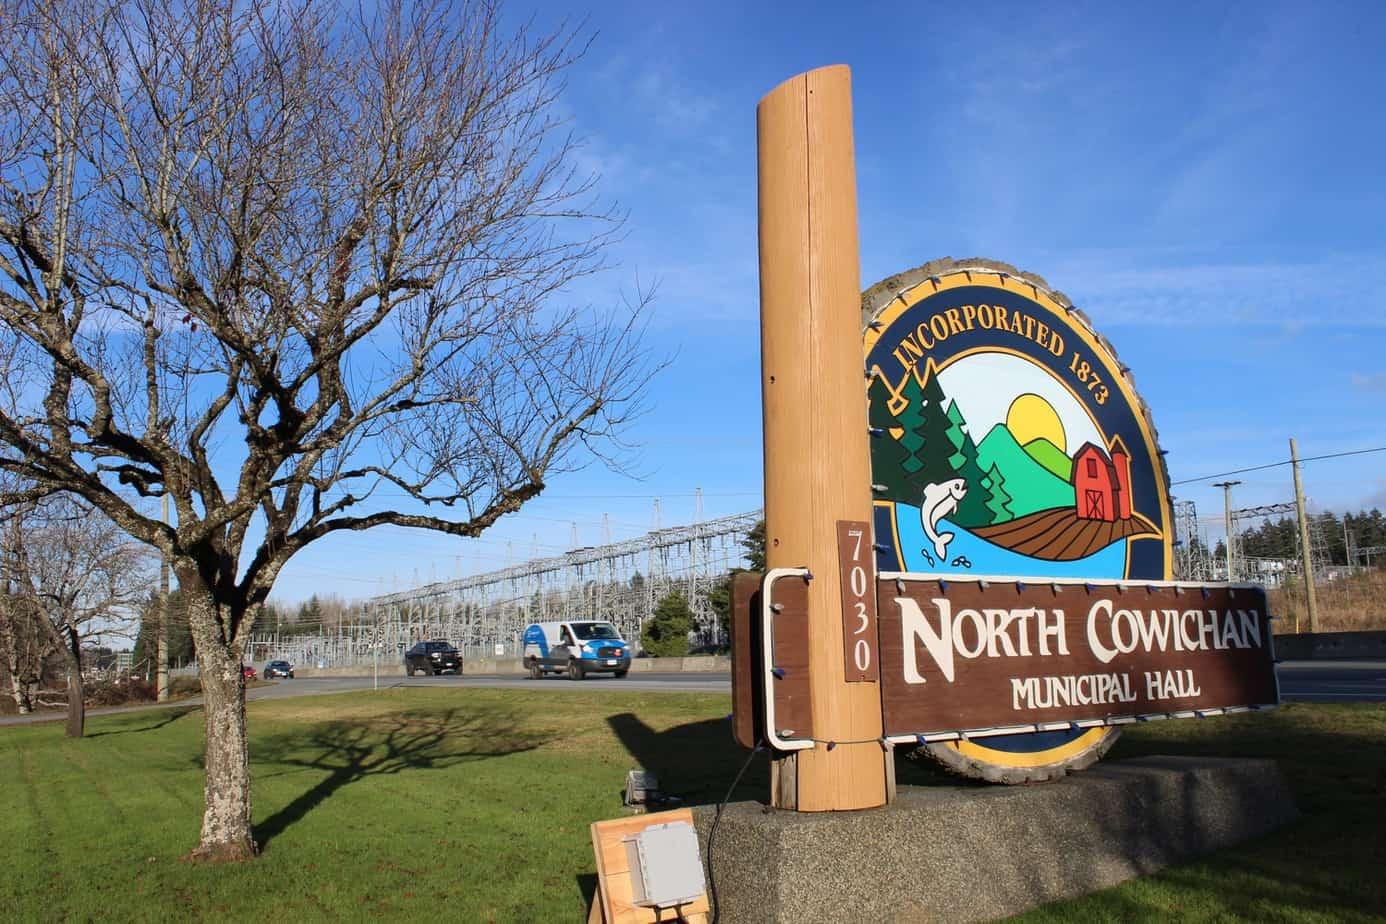 North Coiwchan RCMP budget